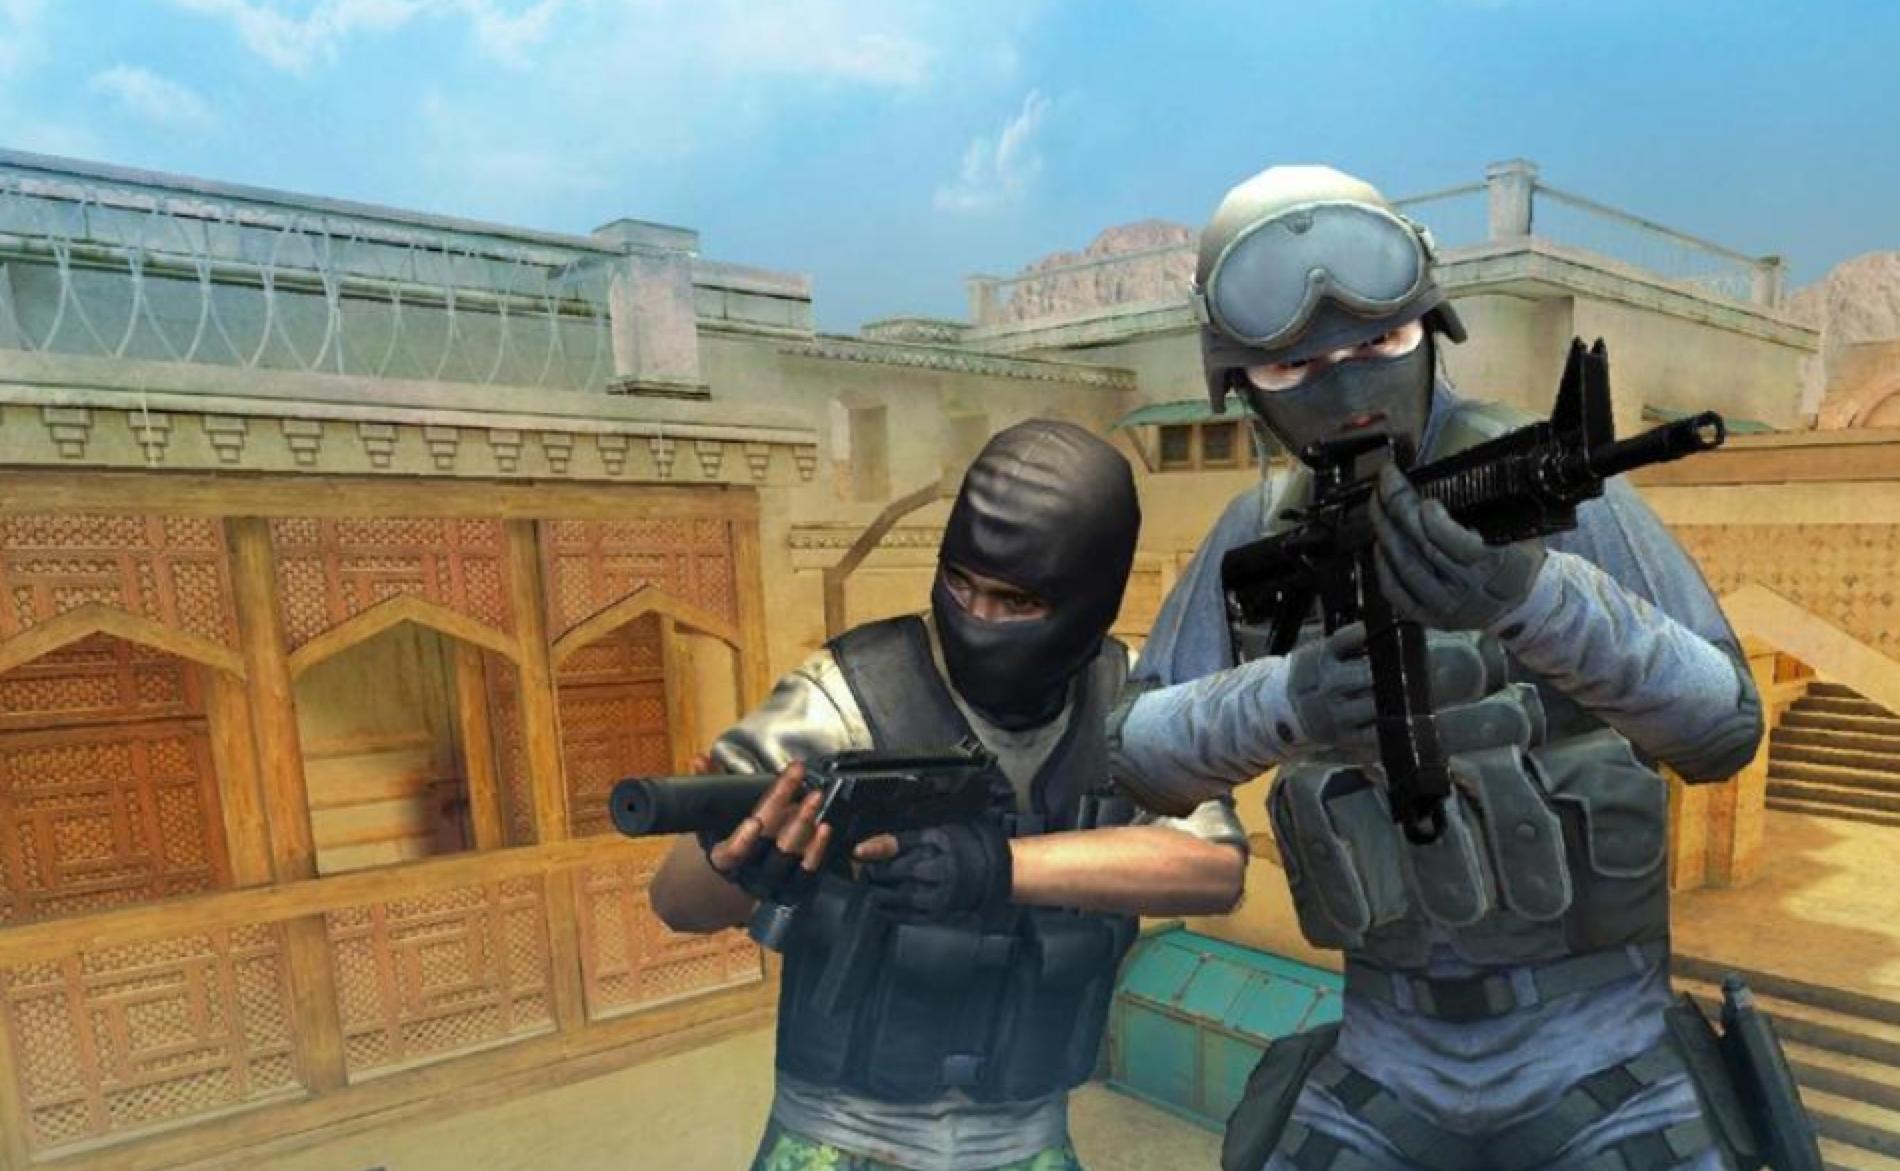 3D Gun Games No Download shooting games - free online shooting games